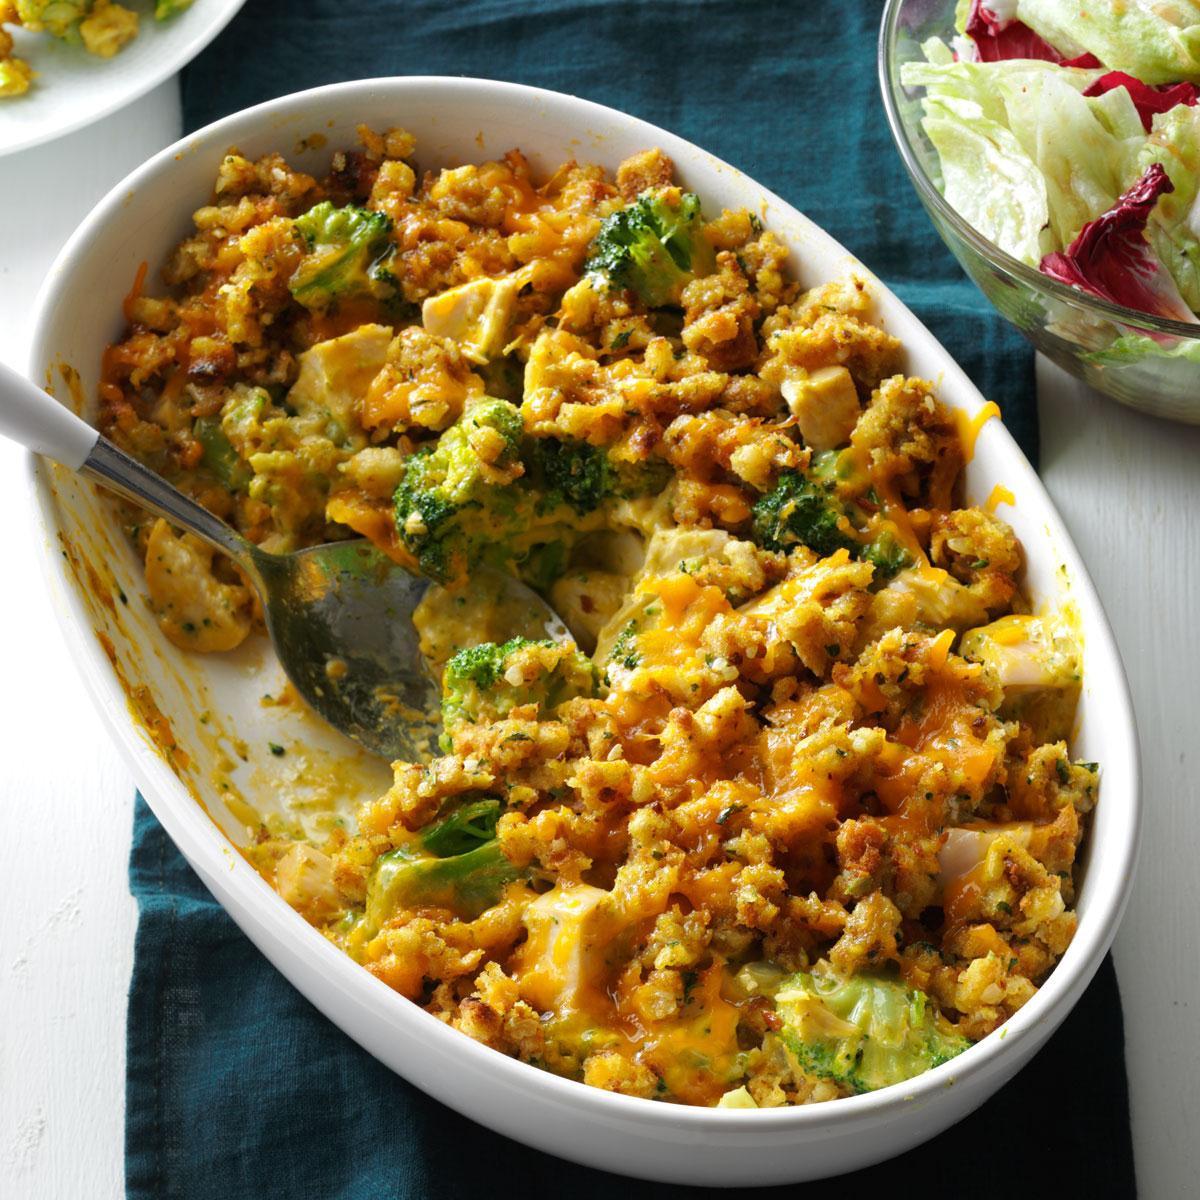 Broccoli Casserole Recipes  Contest Winning Broccoli Chicken Casserole Recipe